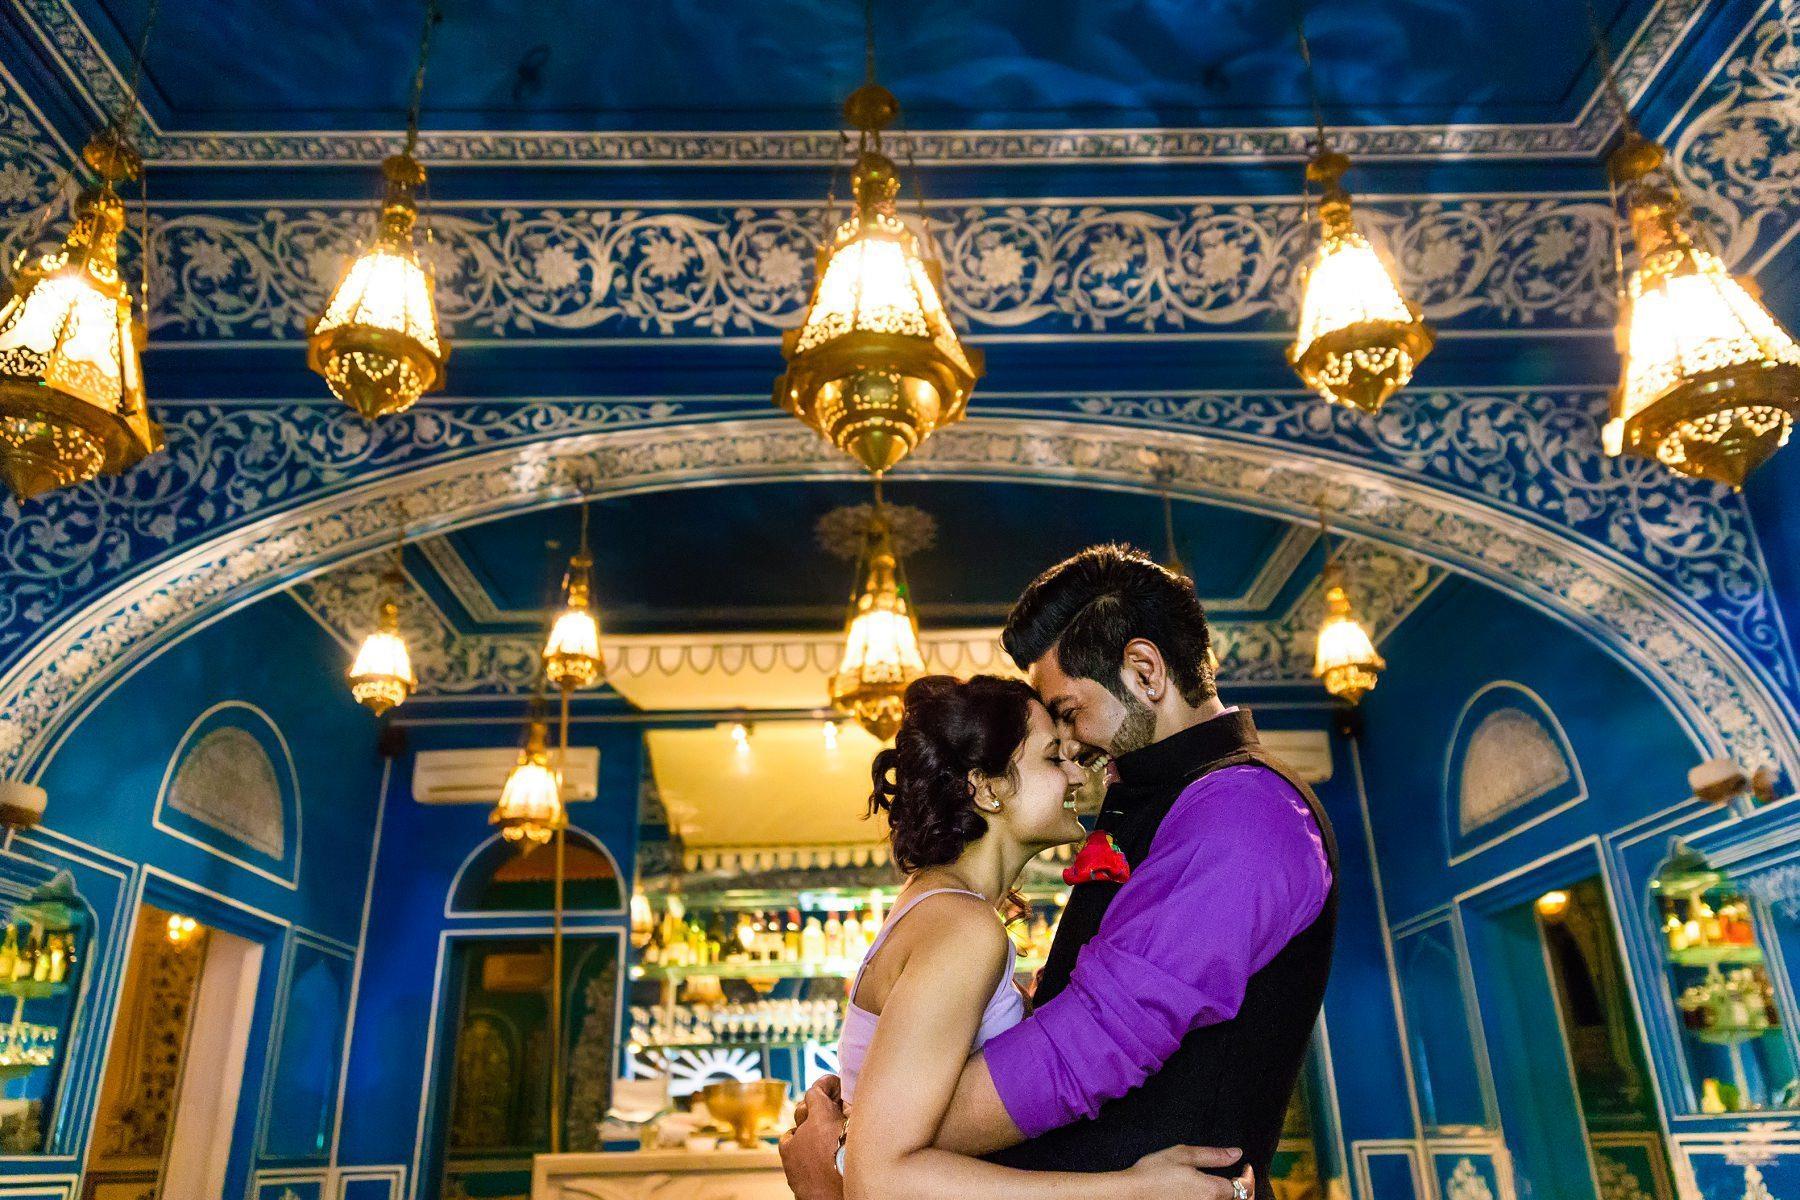 Best Wedding Photographs 2015 - Engagements